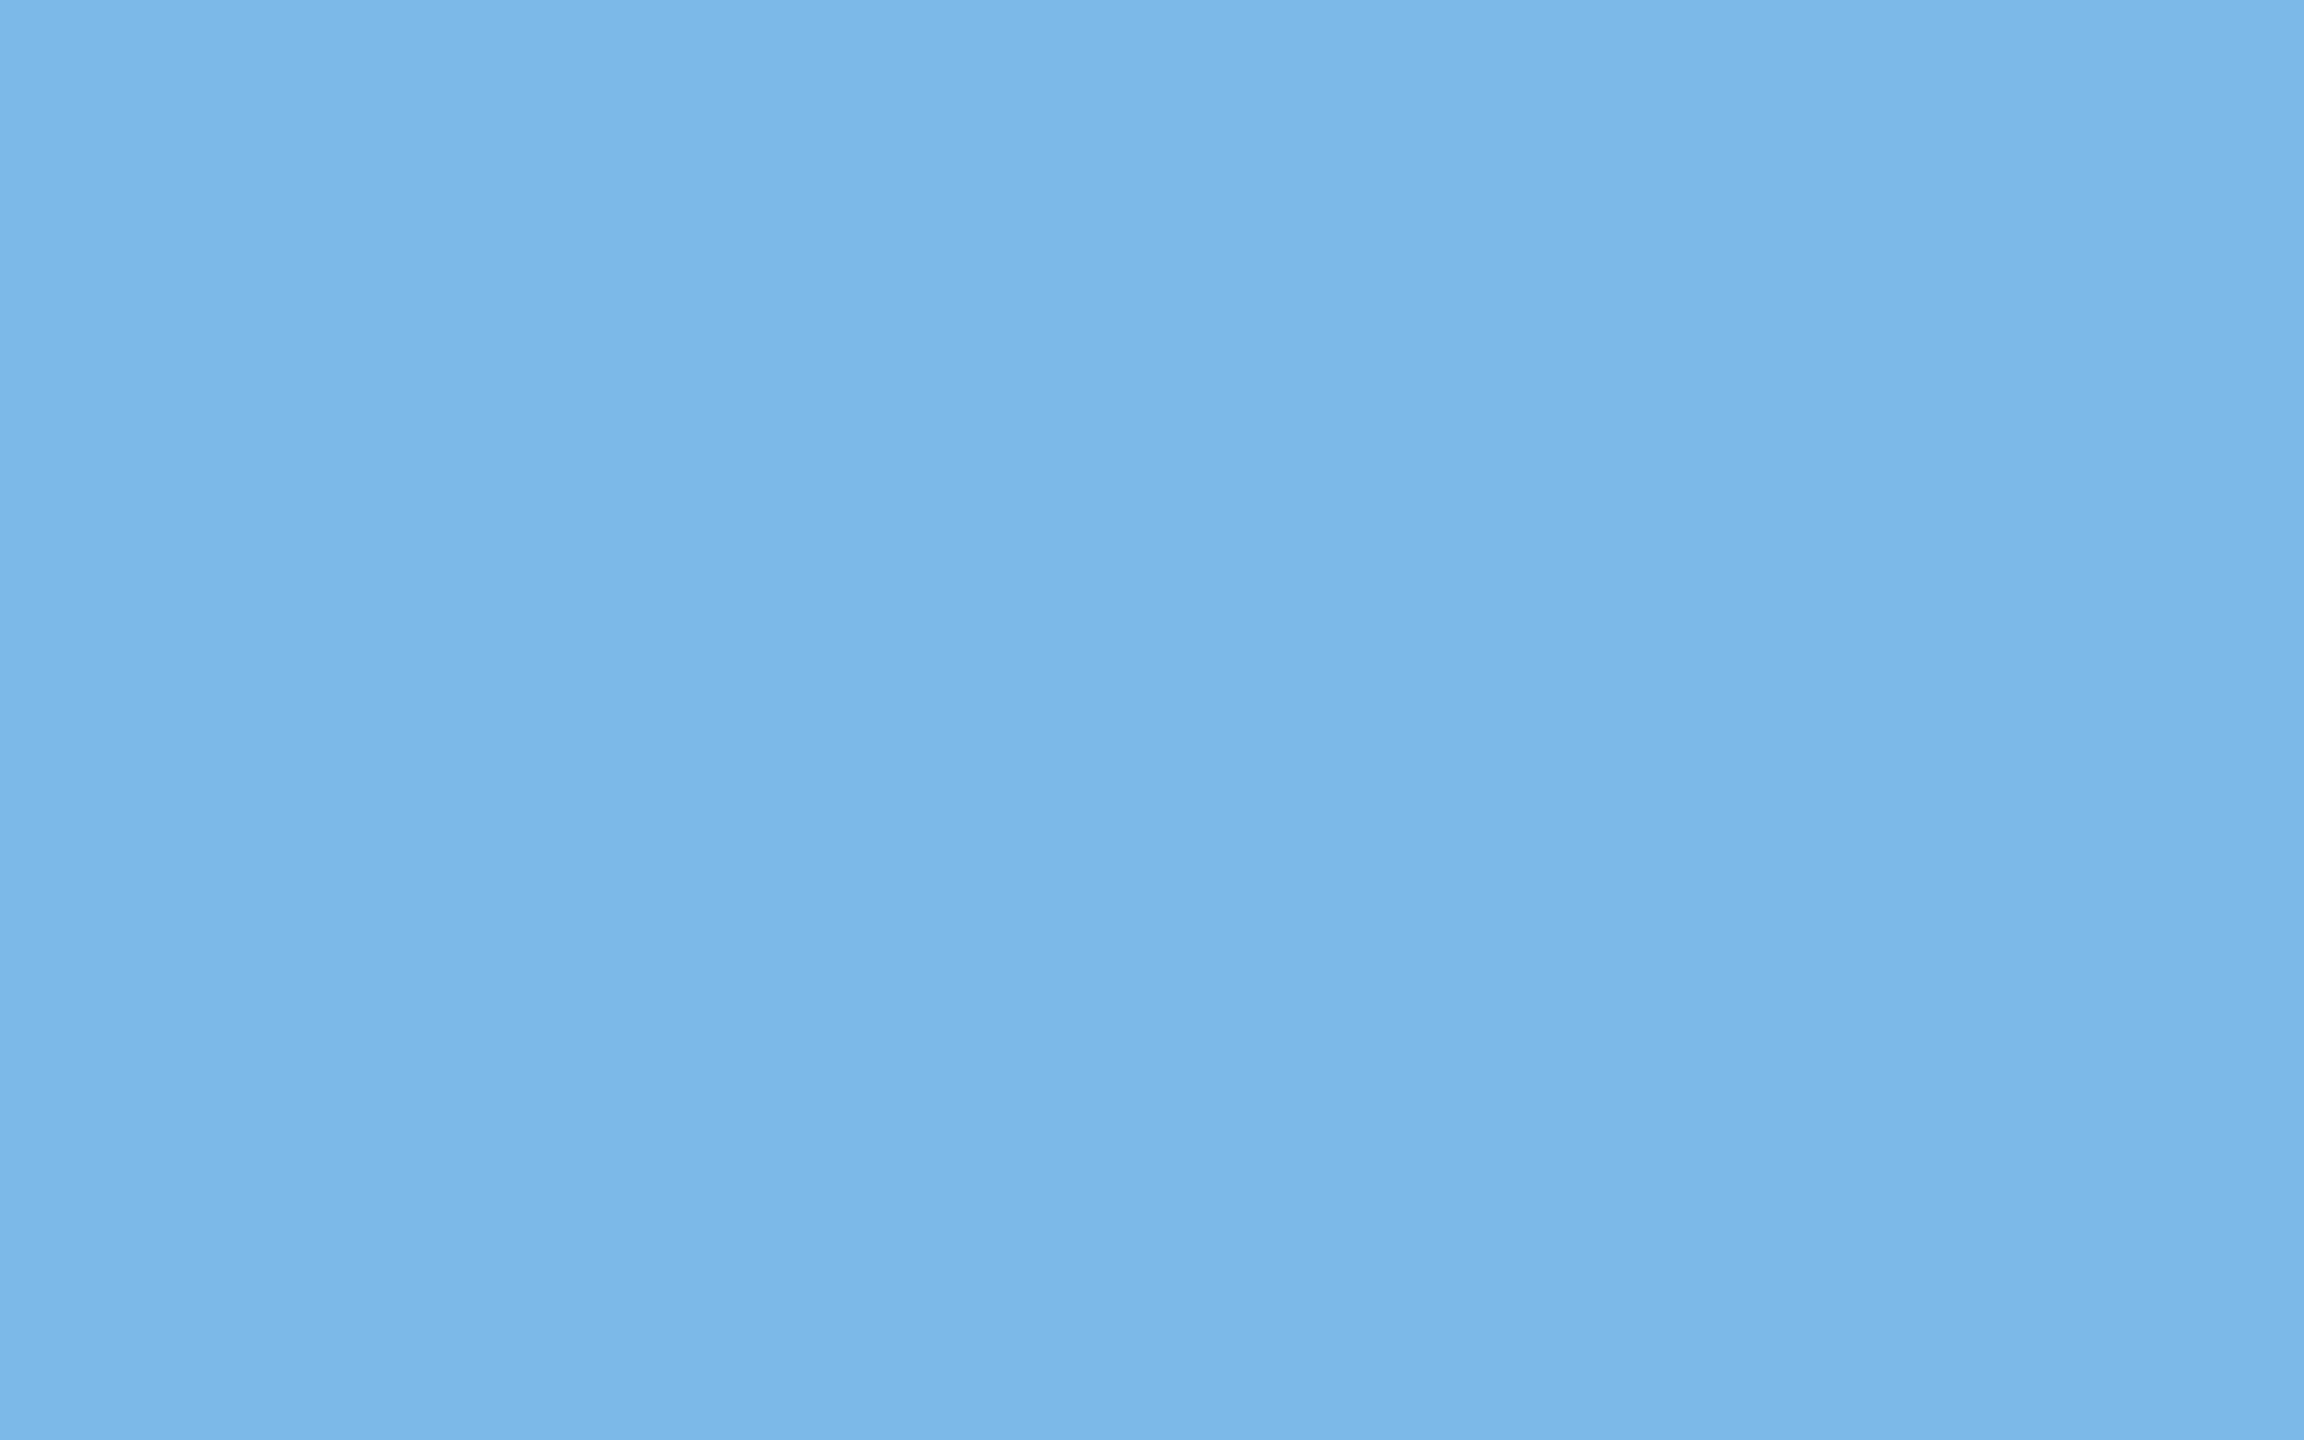 2304x1440 Aero Solid Color Background